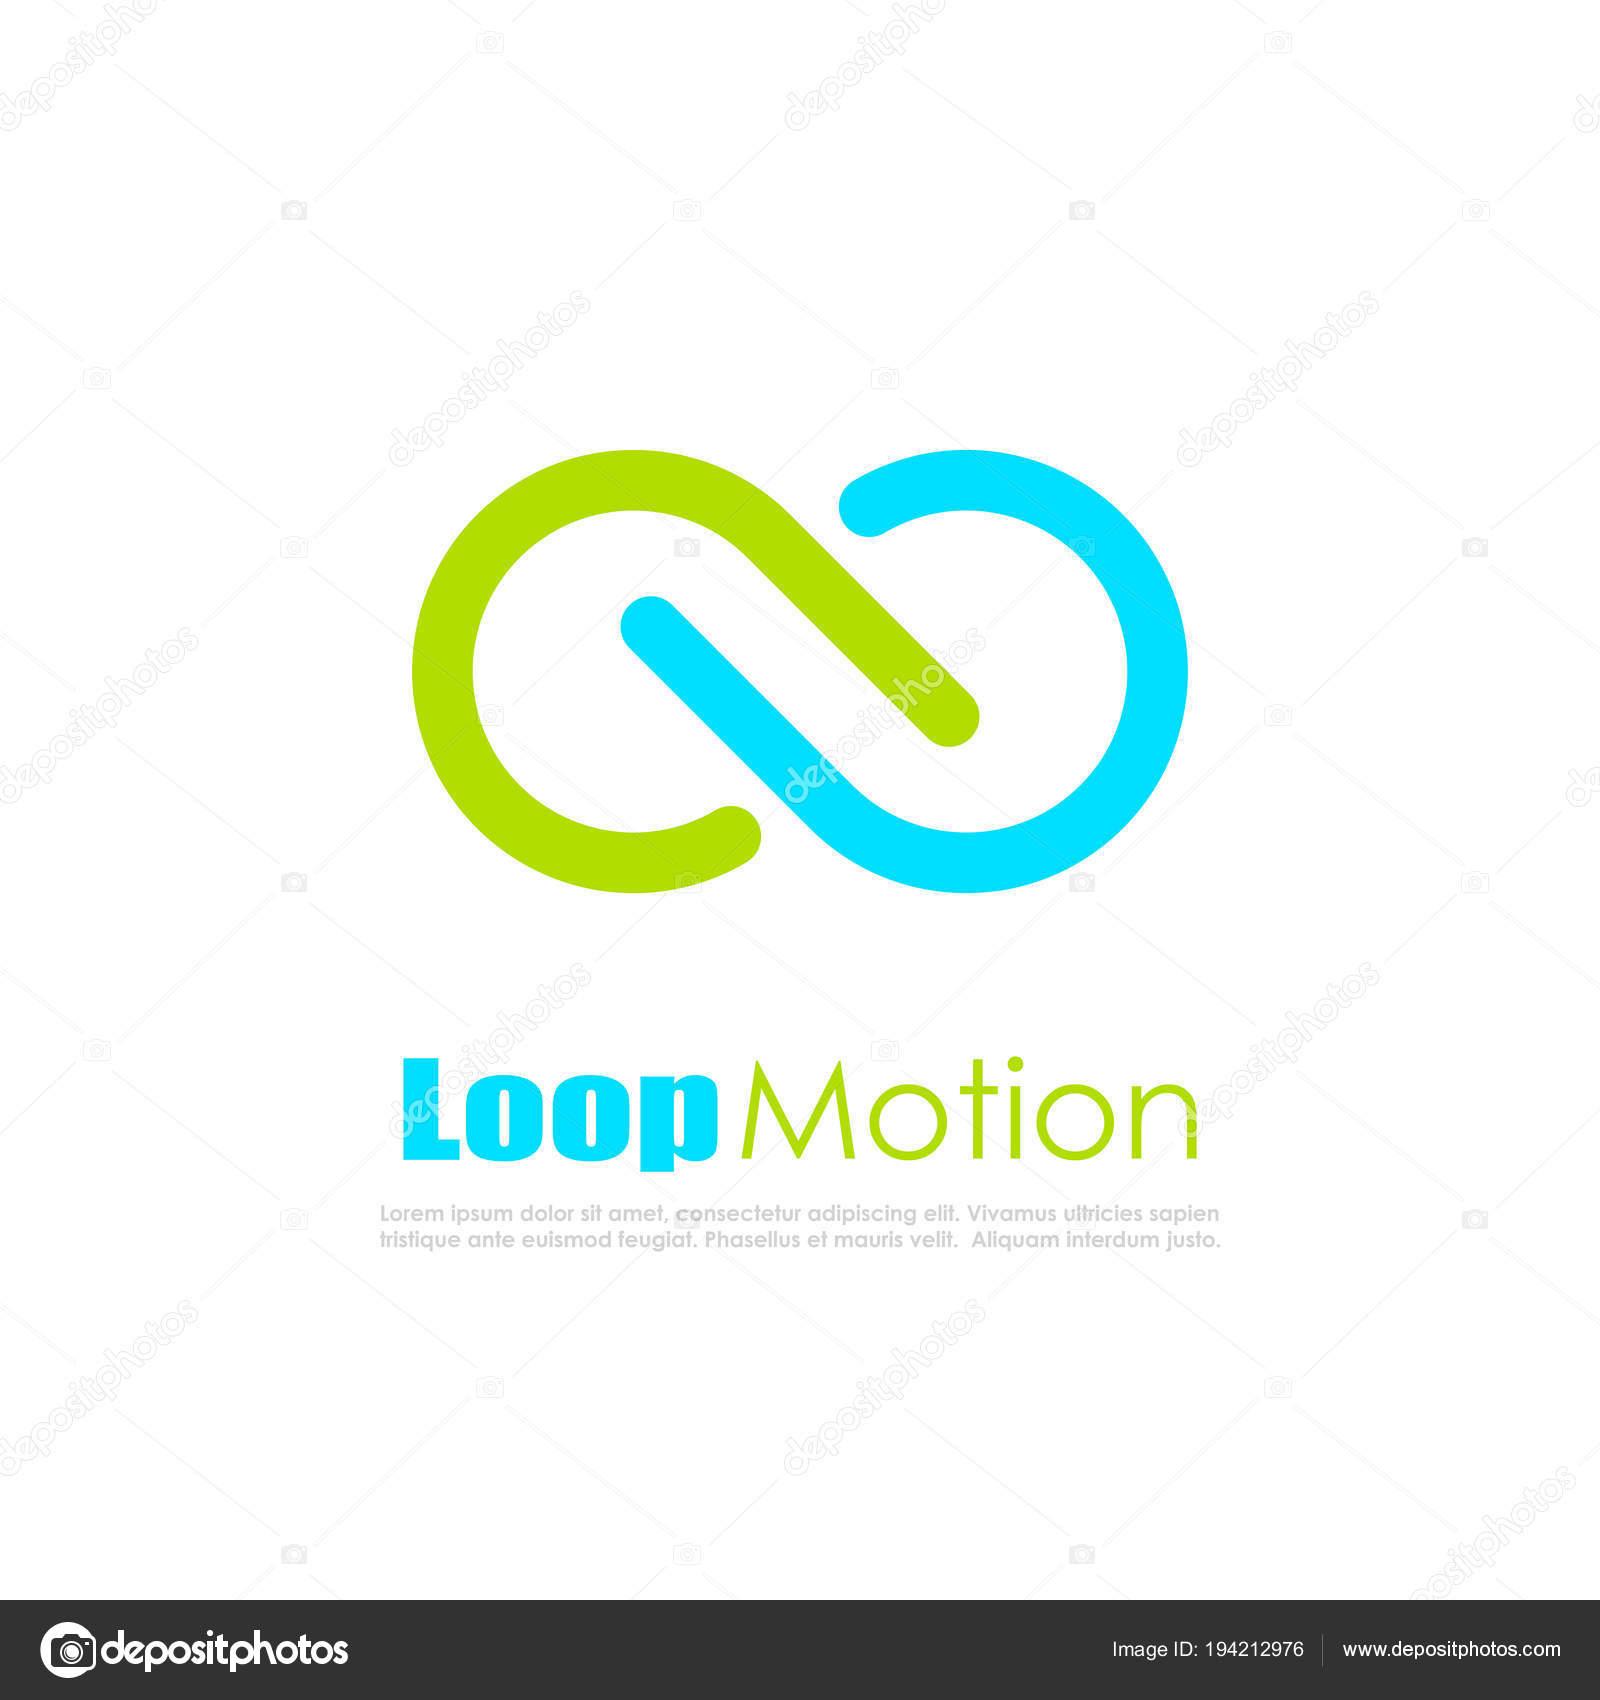 Infinite Loop Motion Abstract Vector Logos Illustration